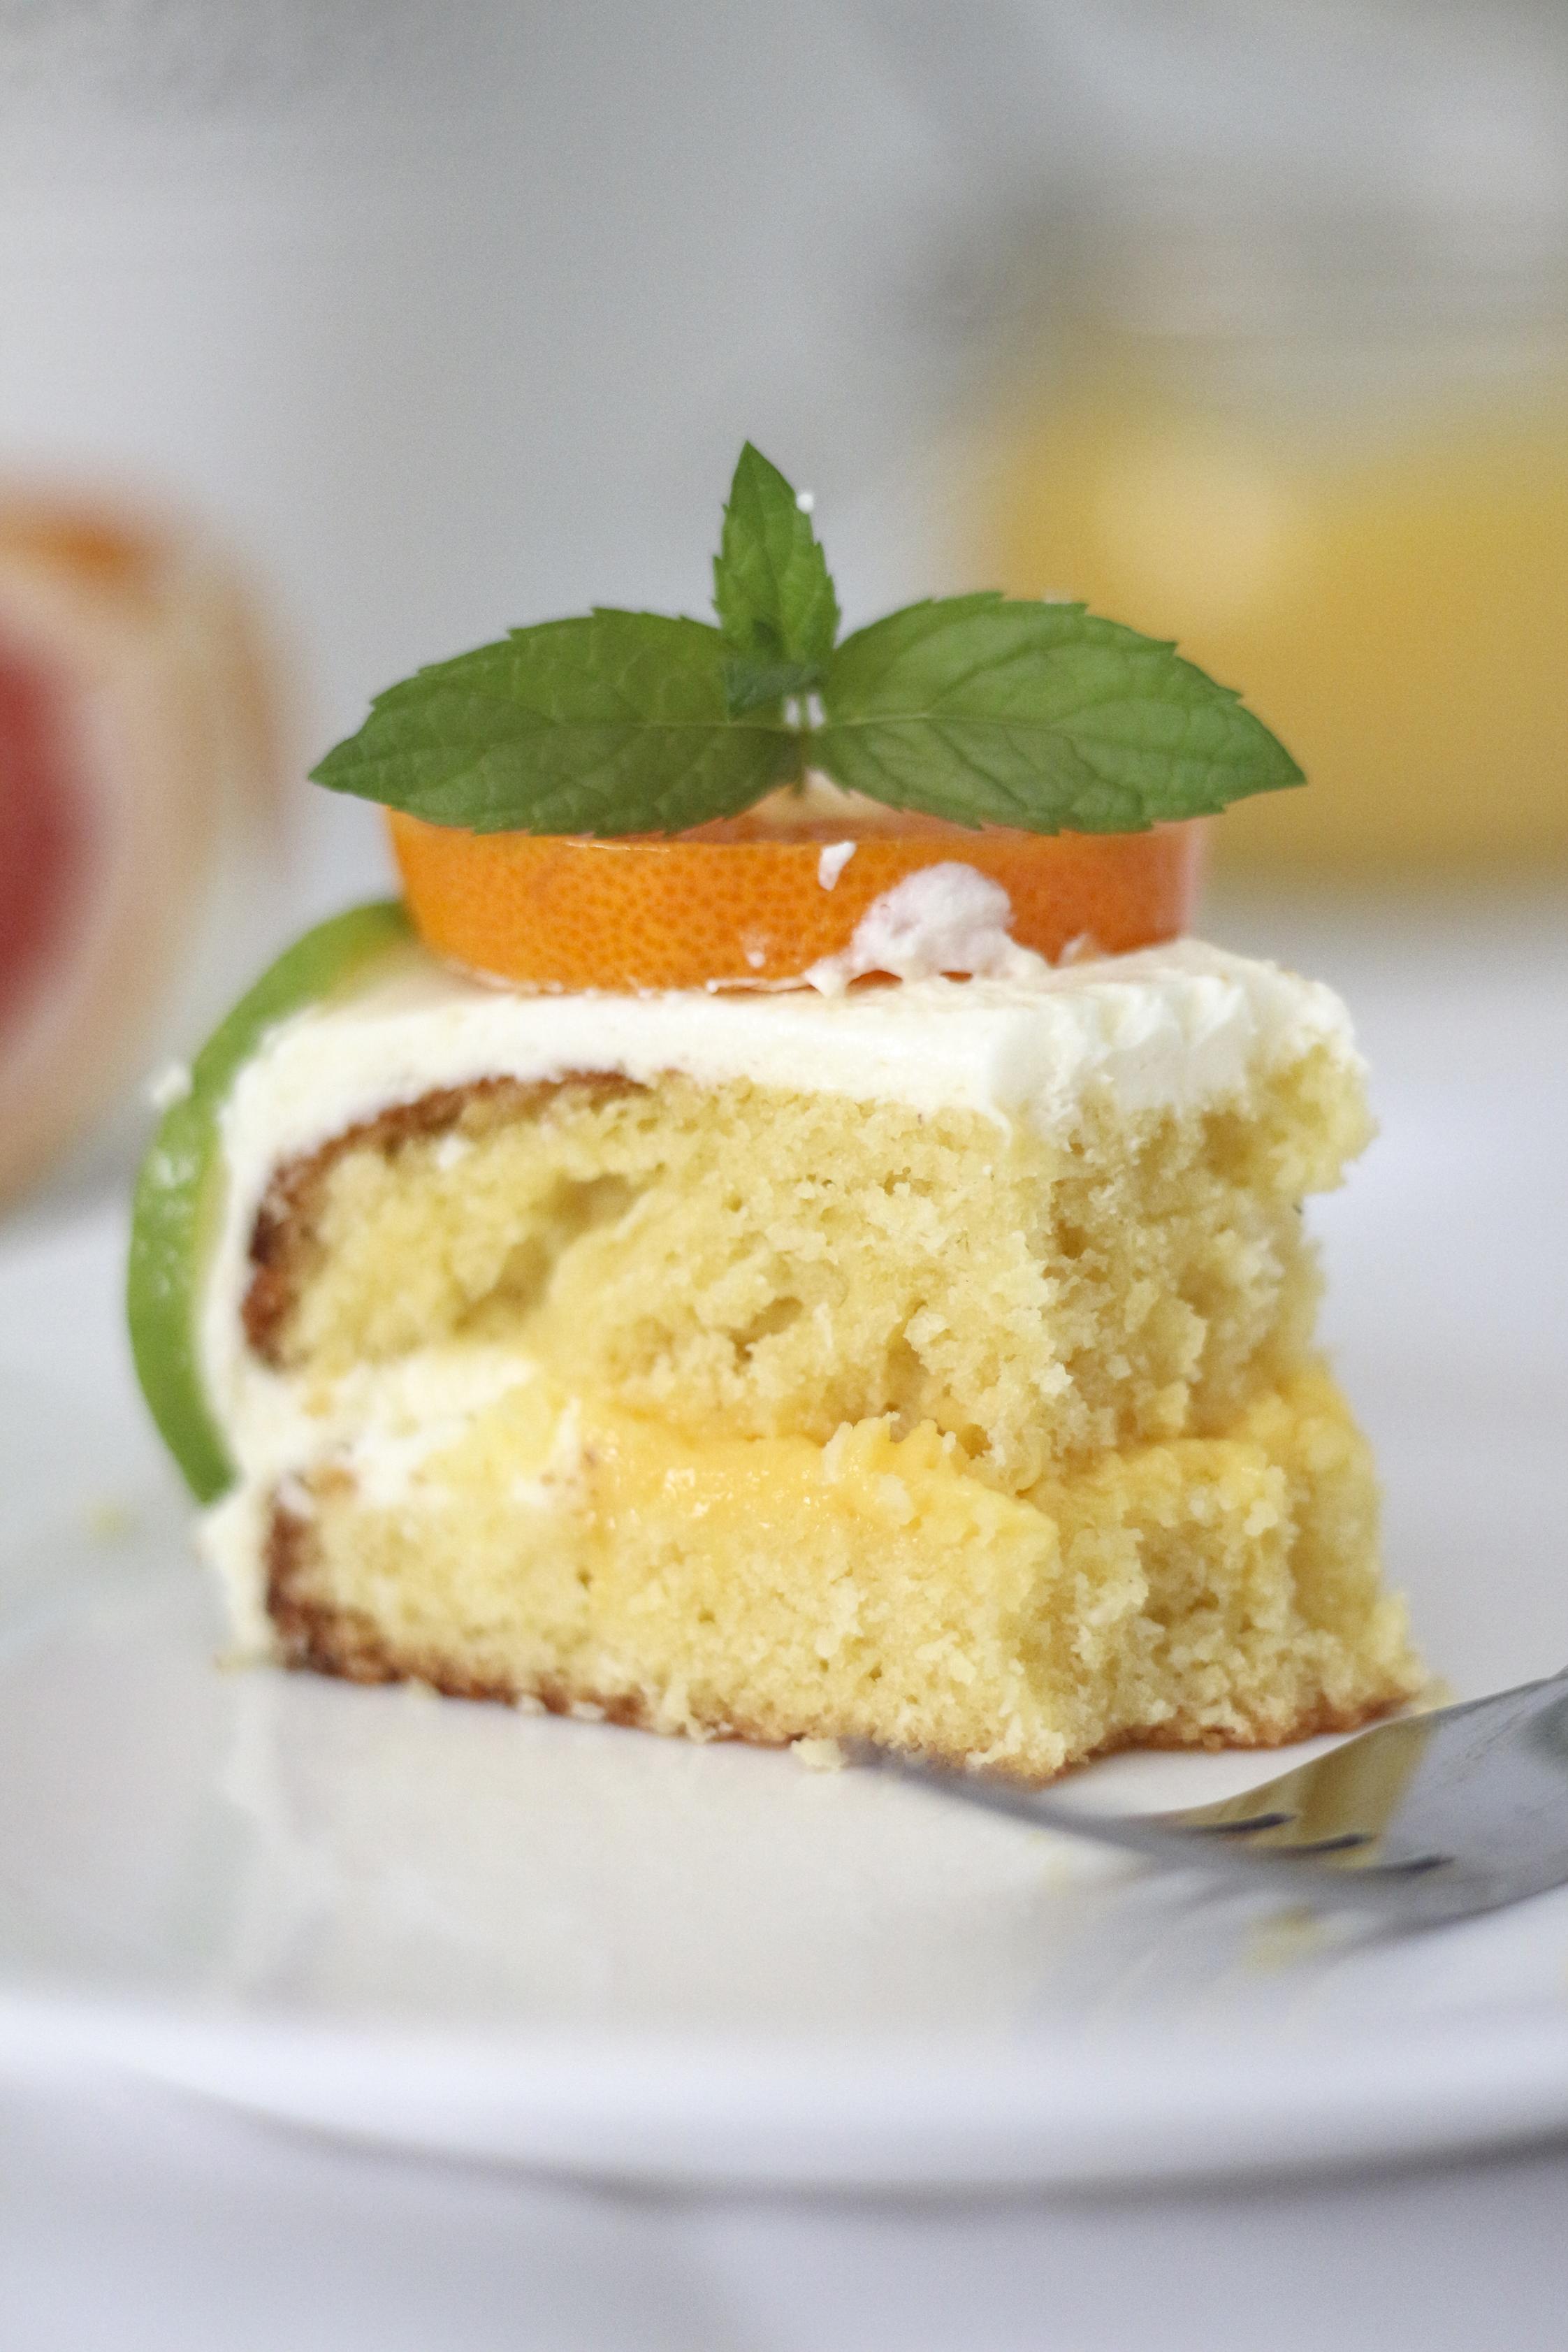 Coconut Cake with Citrus12